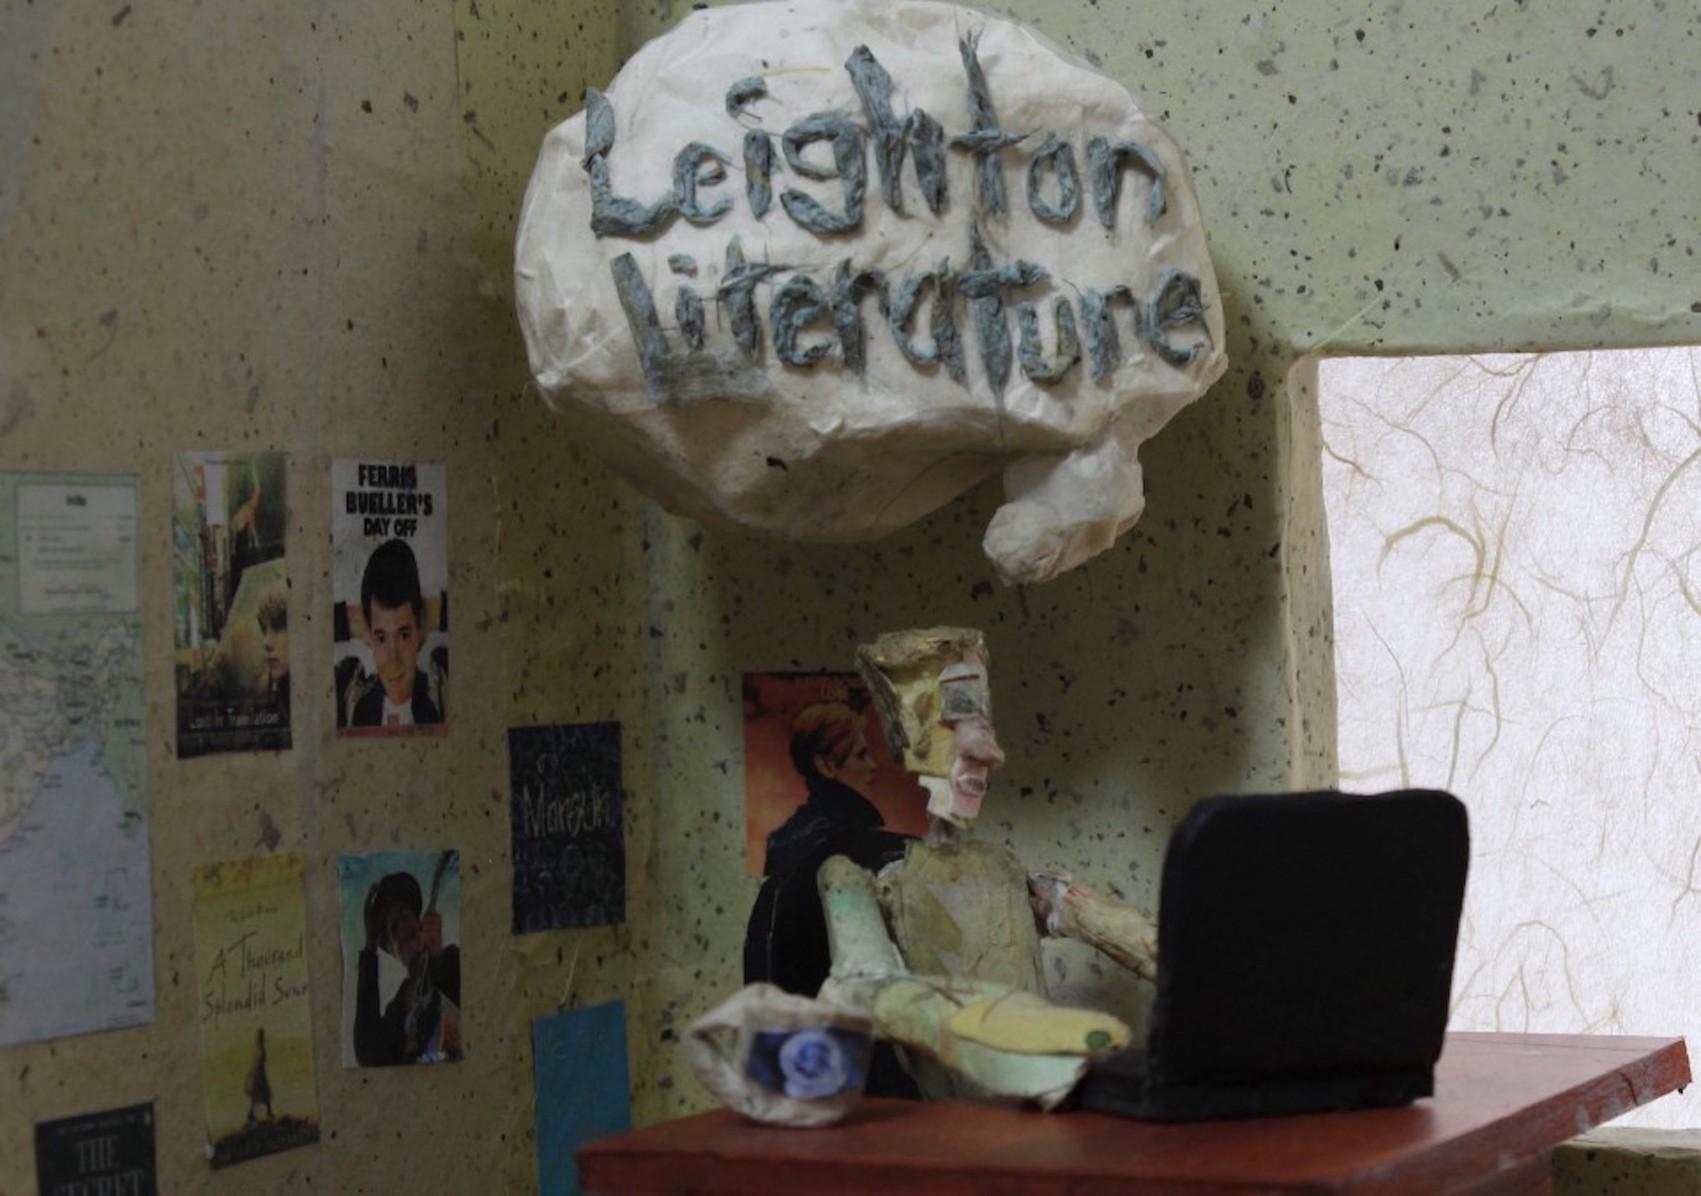 Leighton Literature travel reports short stories travel blogger digital nomad